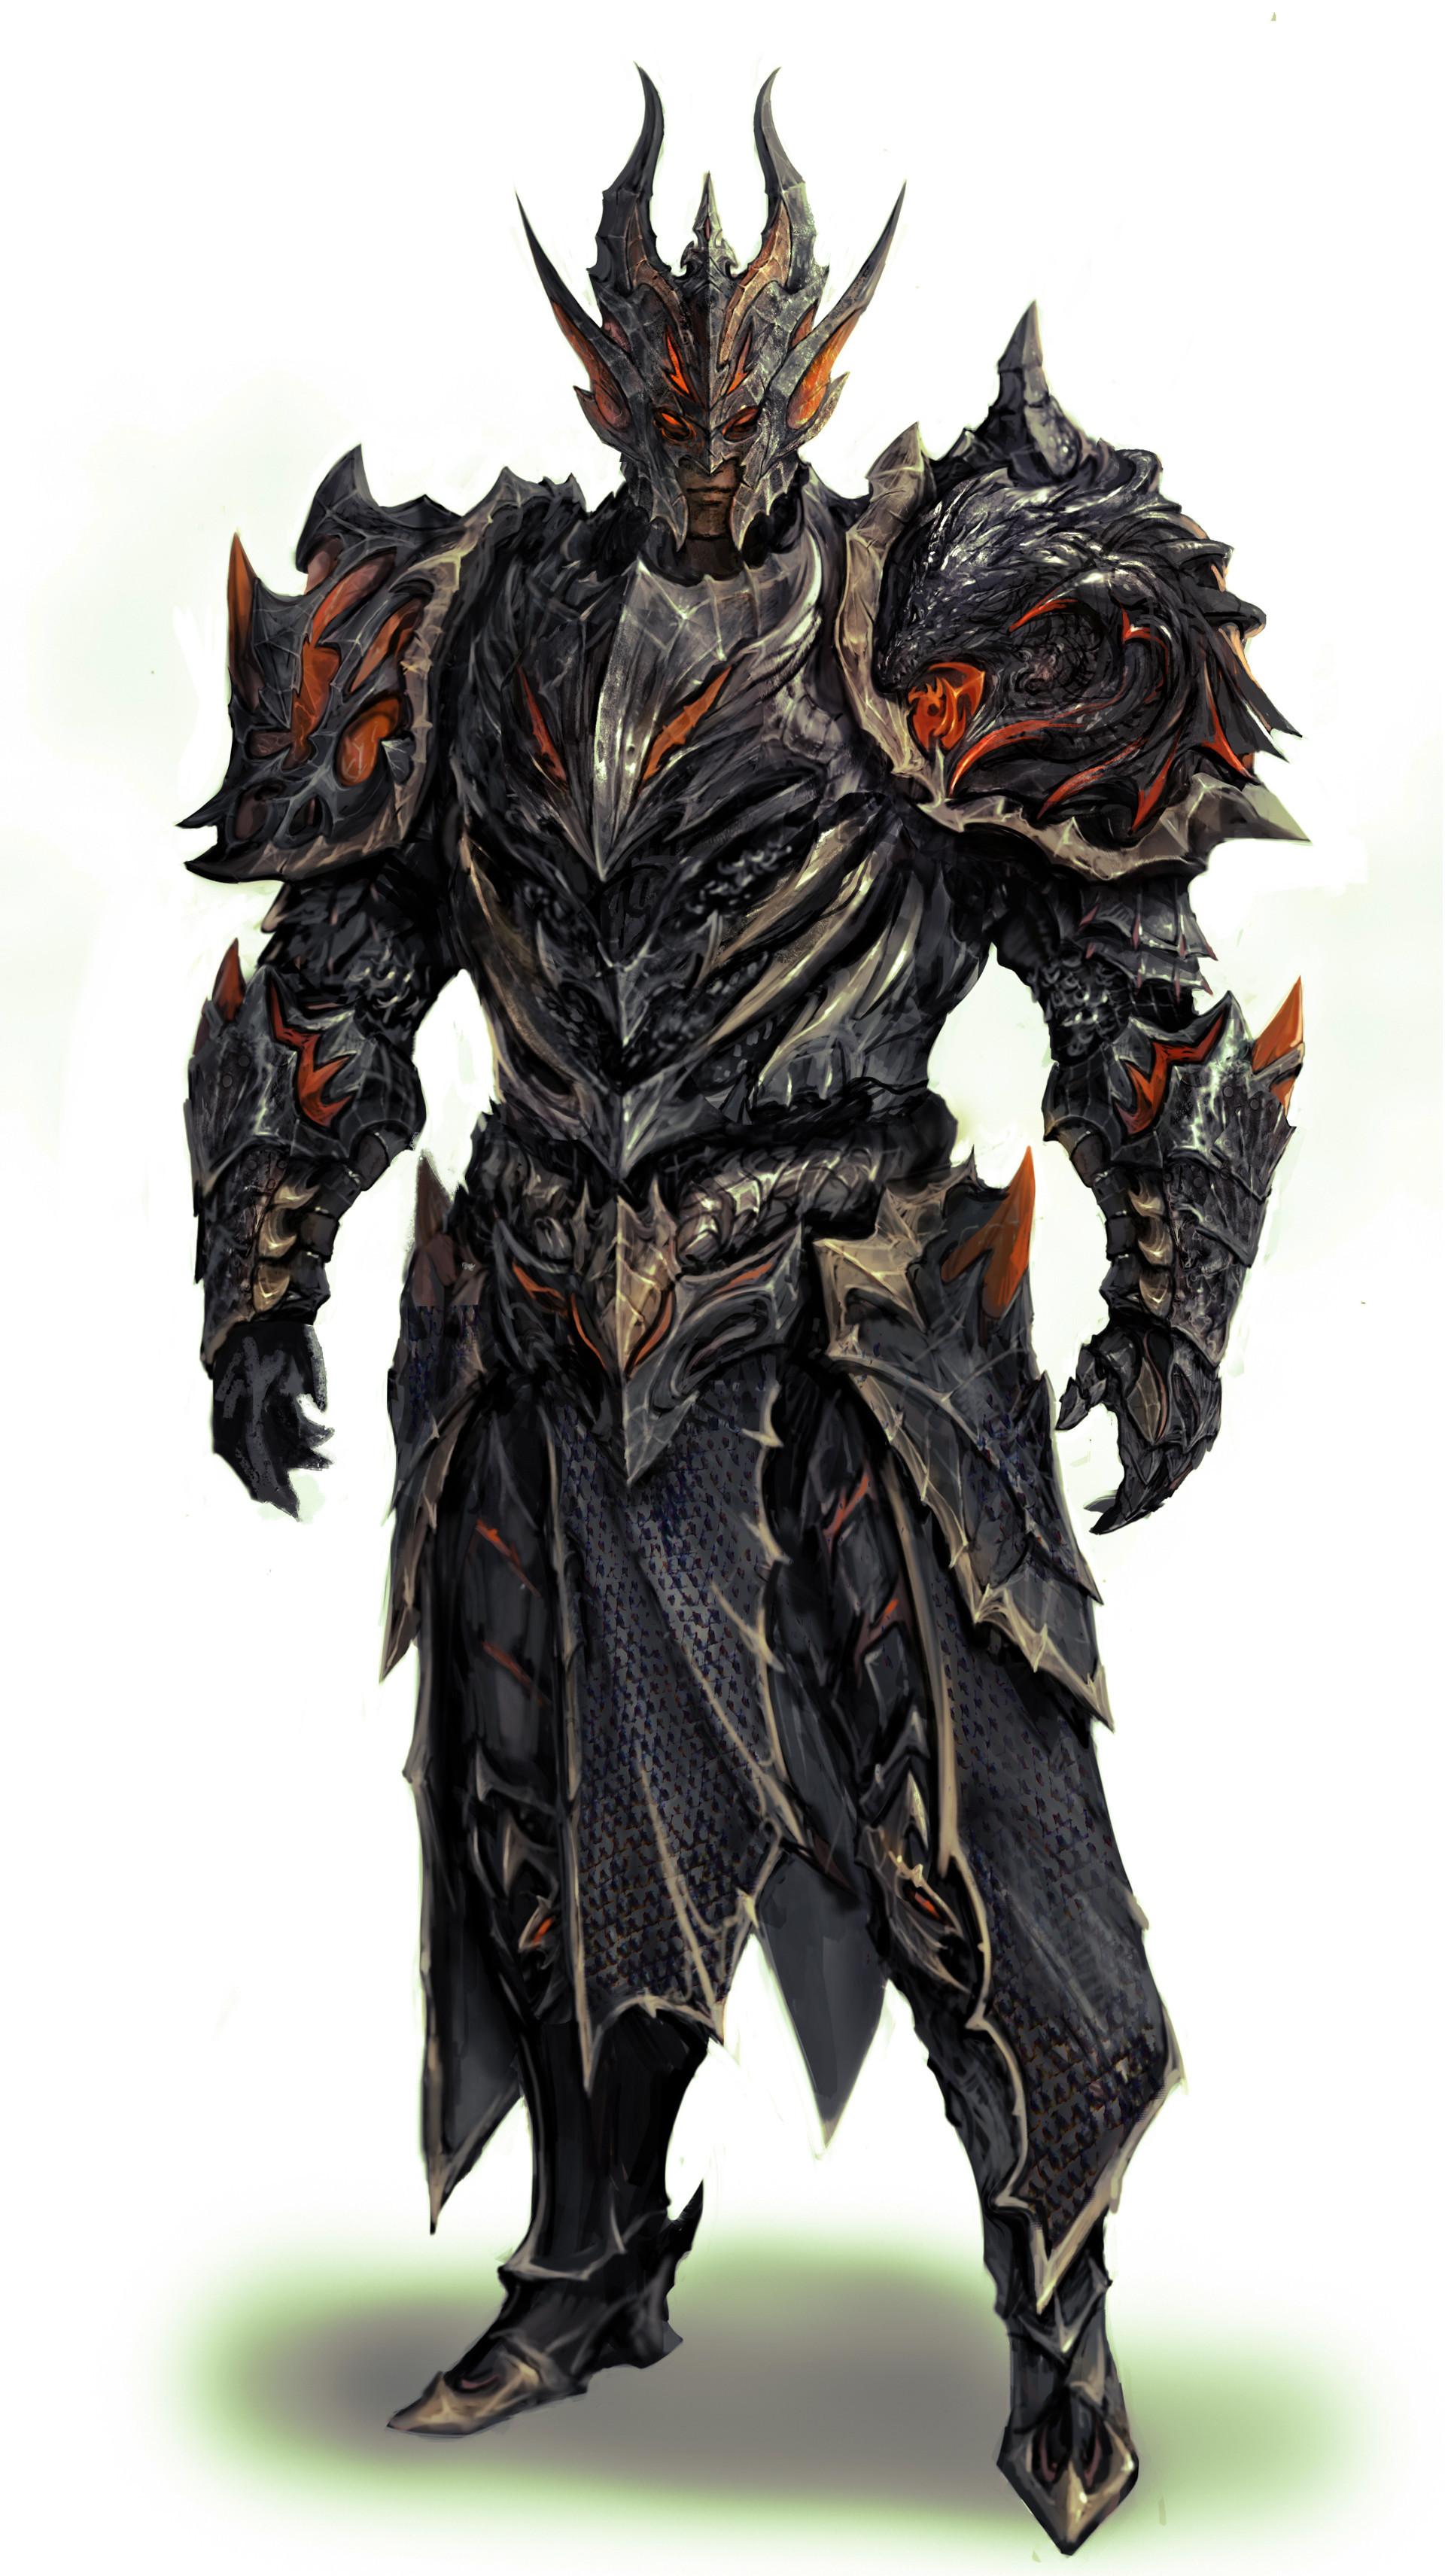 Artstation Dragon Armor Kyung Han Kim A character from anime demons high school. artstation dragon armor kyung han kim